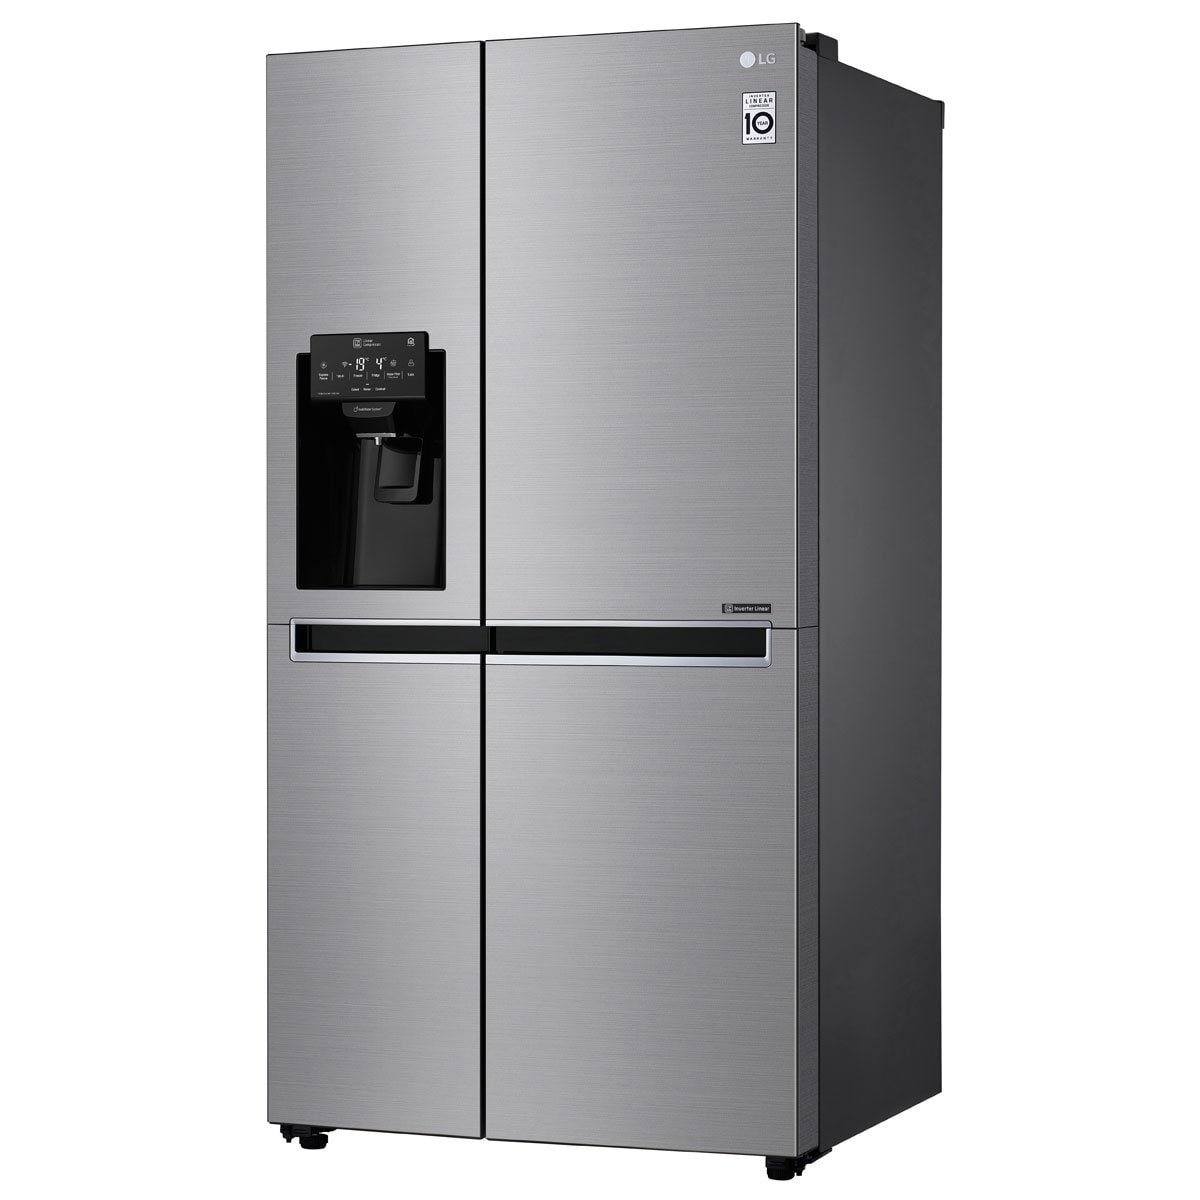 Refrigerador Duplex Silver 26 Pies Lg